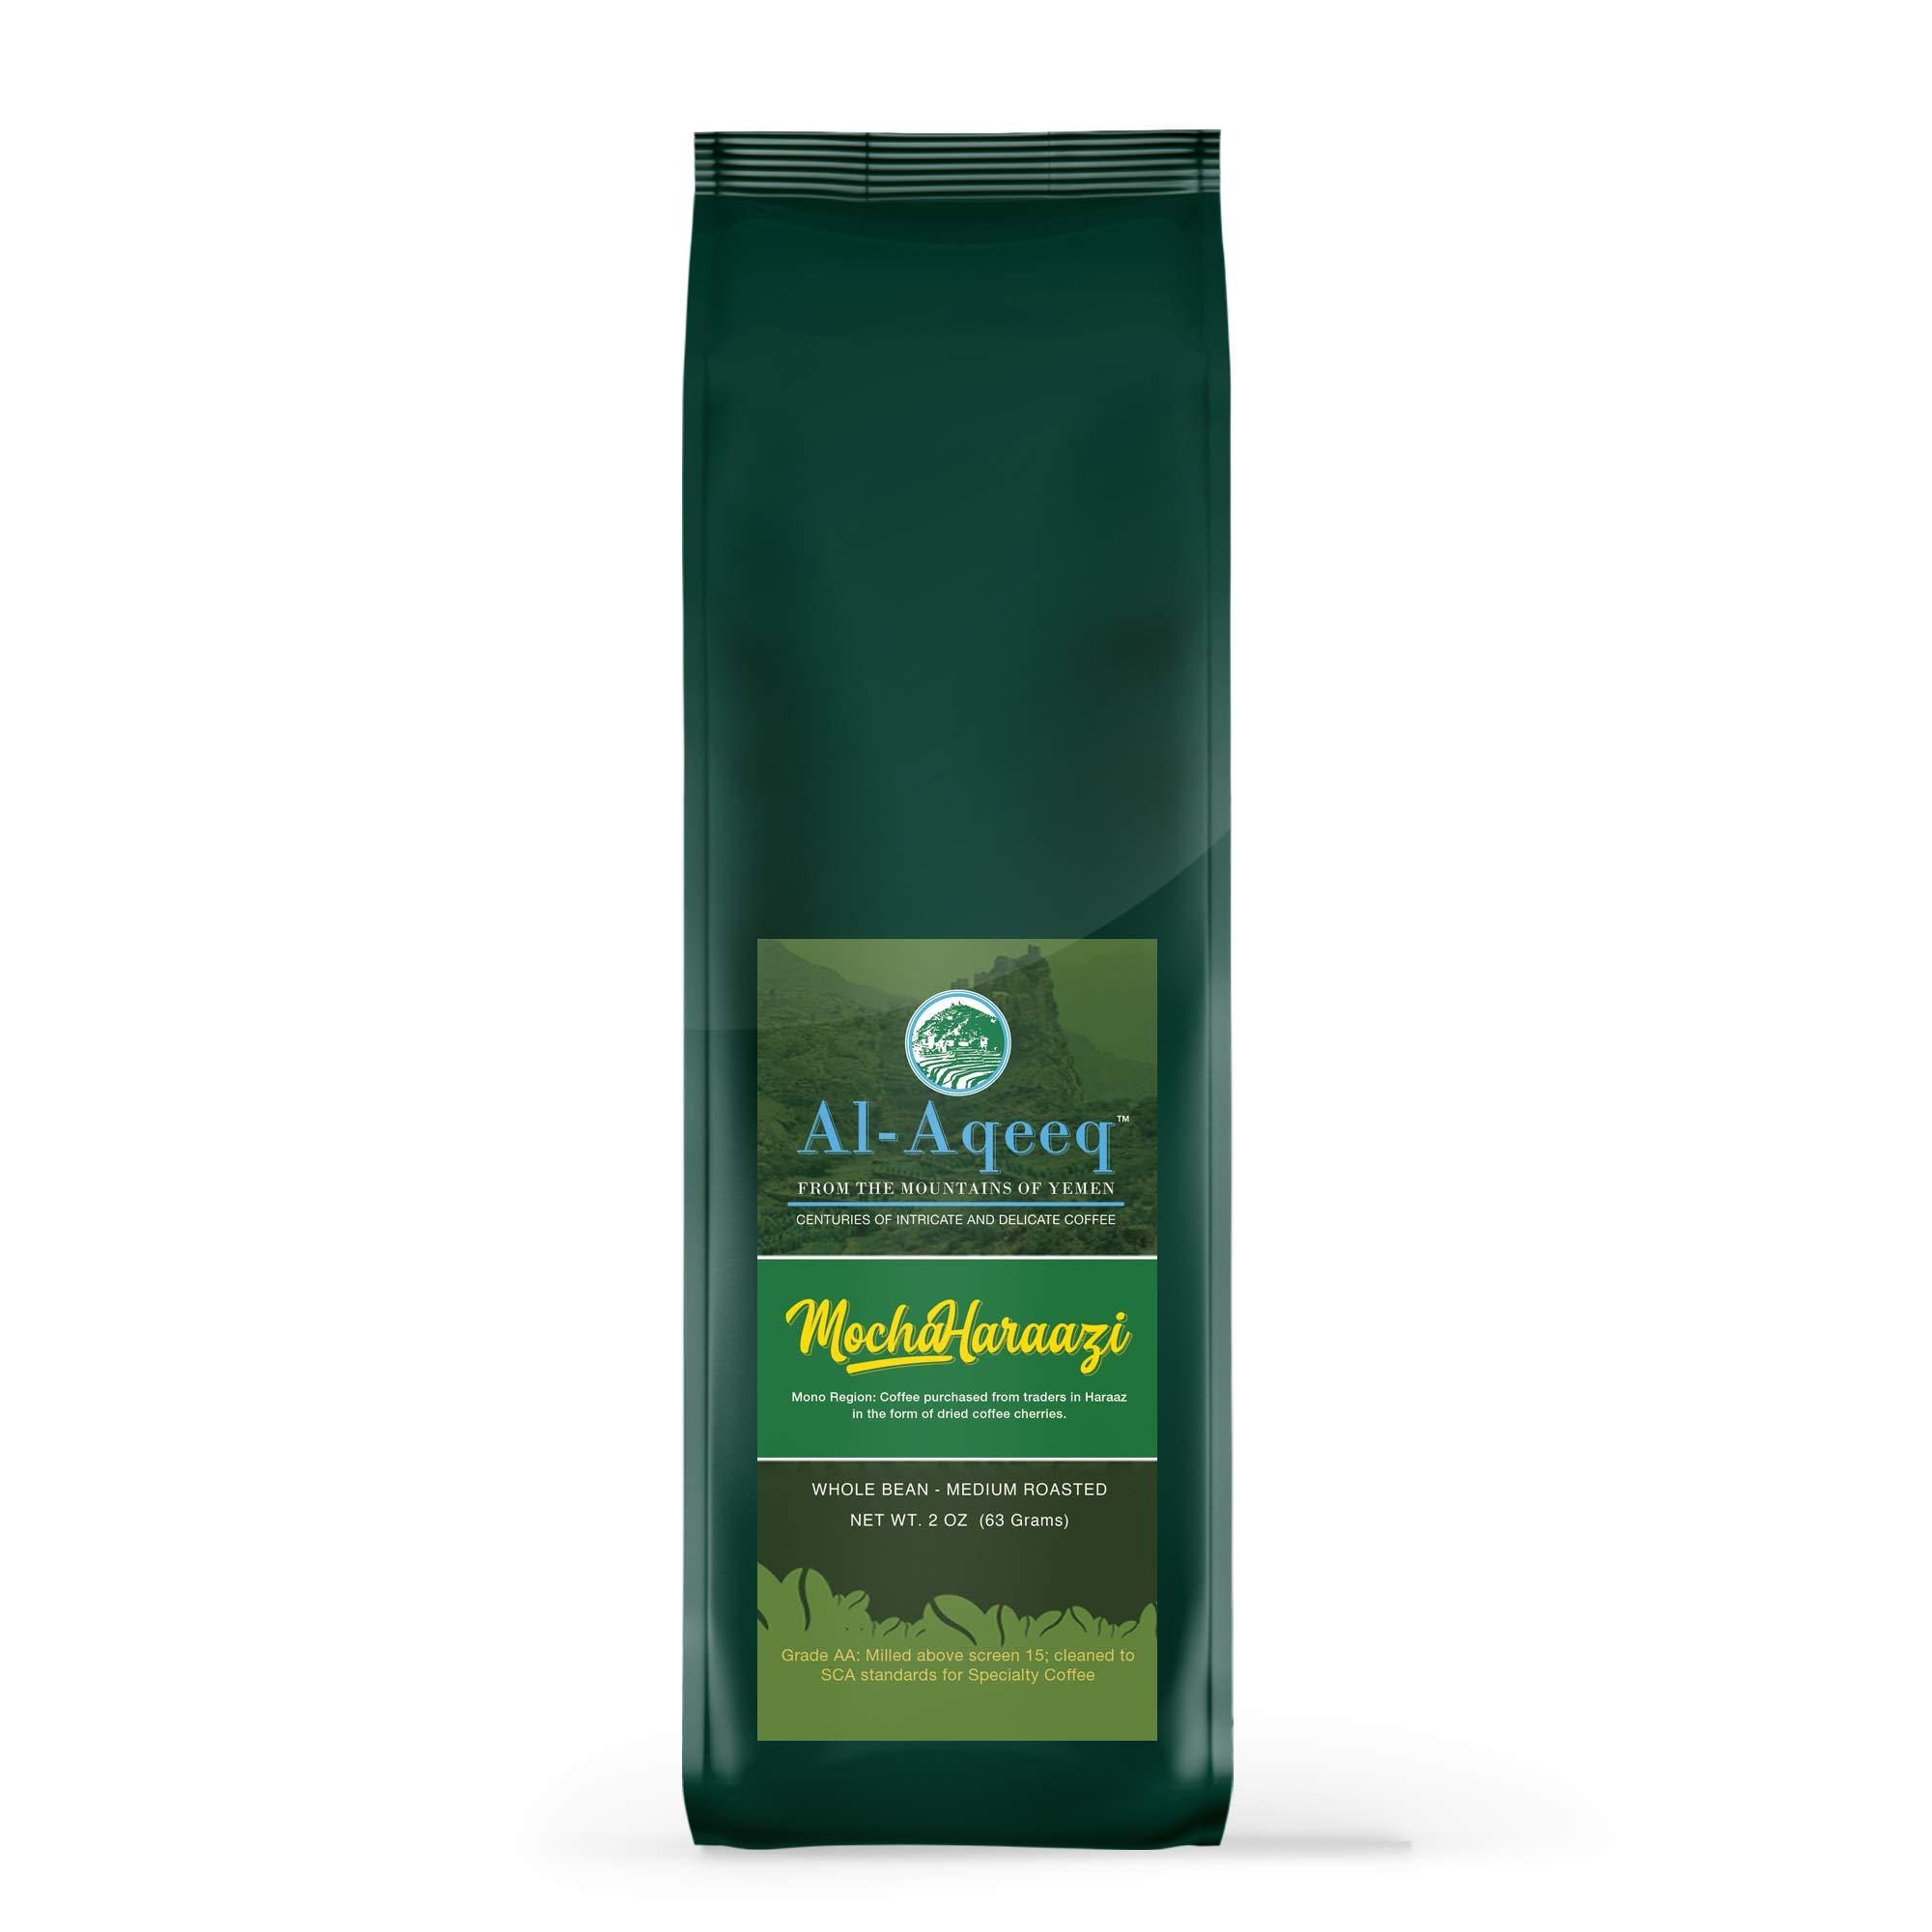 Al-Aqeeq: The Tiny Yet Powerful  Authentic Yemen Coffee  Freshly Roasted Yemeni Coffee  Mocha-Haraazi Coffee Beans  Coffee From Around The World  Arabica Coffee  Medium-Roasted Whole Bean Coffee  63g